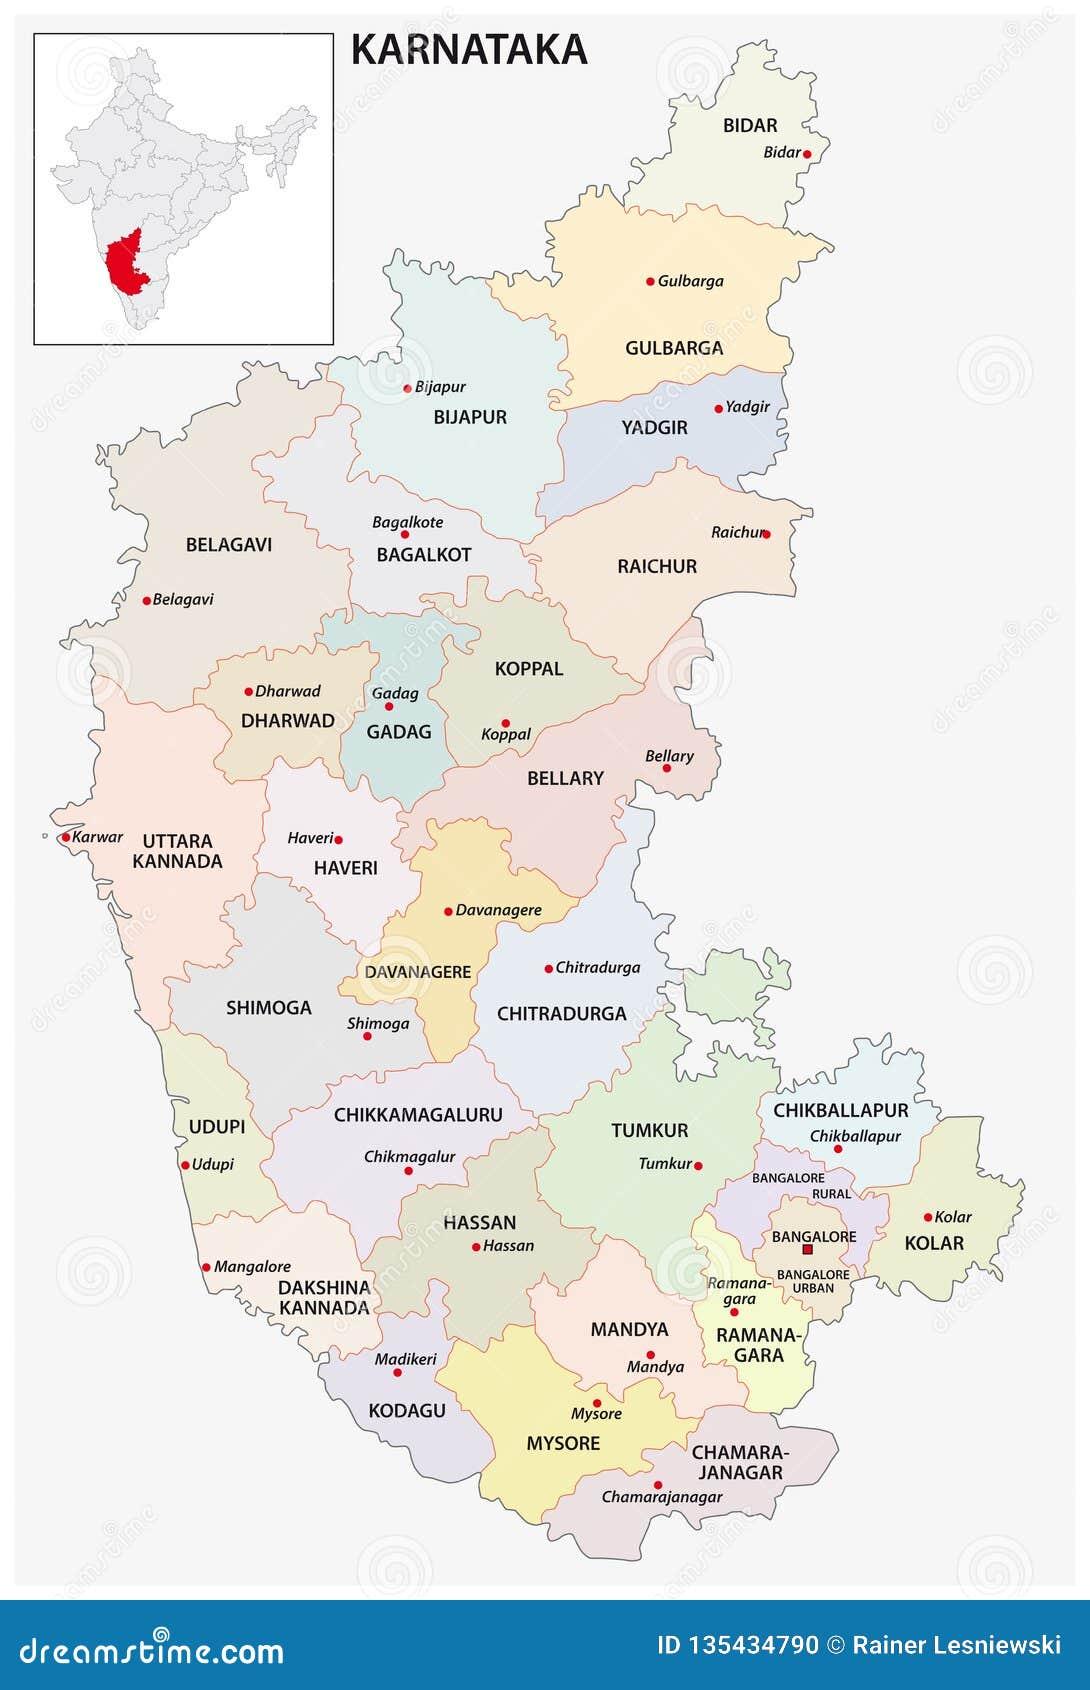 Administrative And Political Map Of Indian State Of Karnataka, India on maps of only india, jharkhand india, states of india, world map india, major rivers of india, maps for india, where's india, political map government, varanasi india, leader of india, northern region of india, political world map, atlas of india, geography of india, bangalore india, north india, map showing india, political map kerala, provinces of india, nashik india,